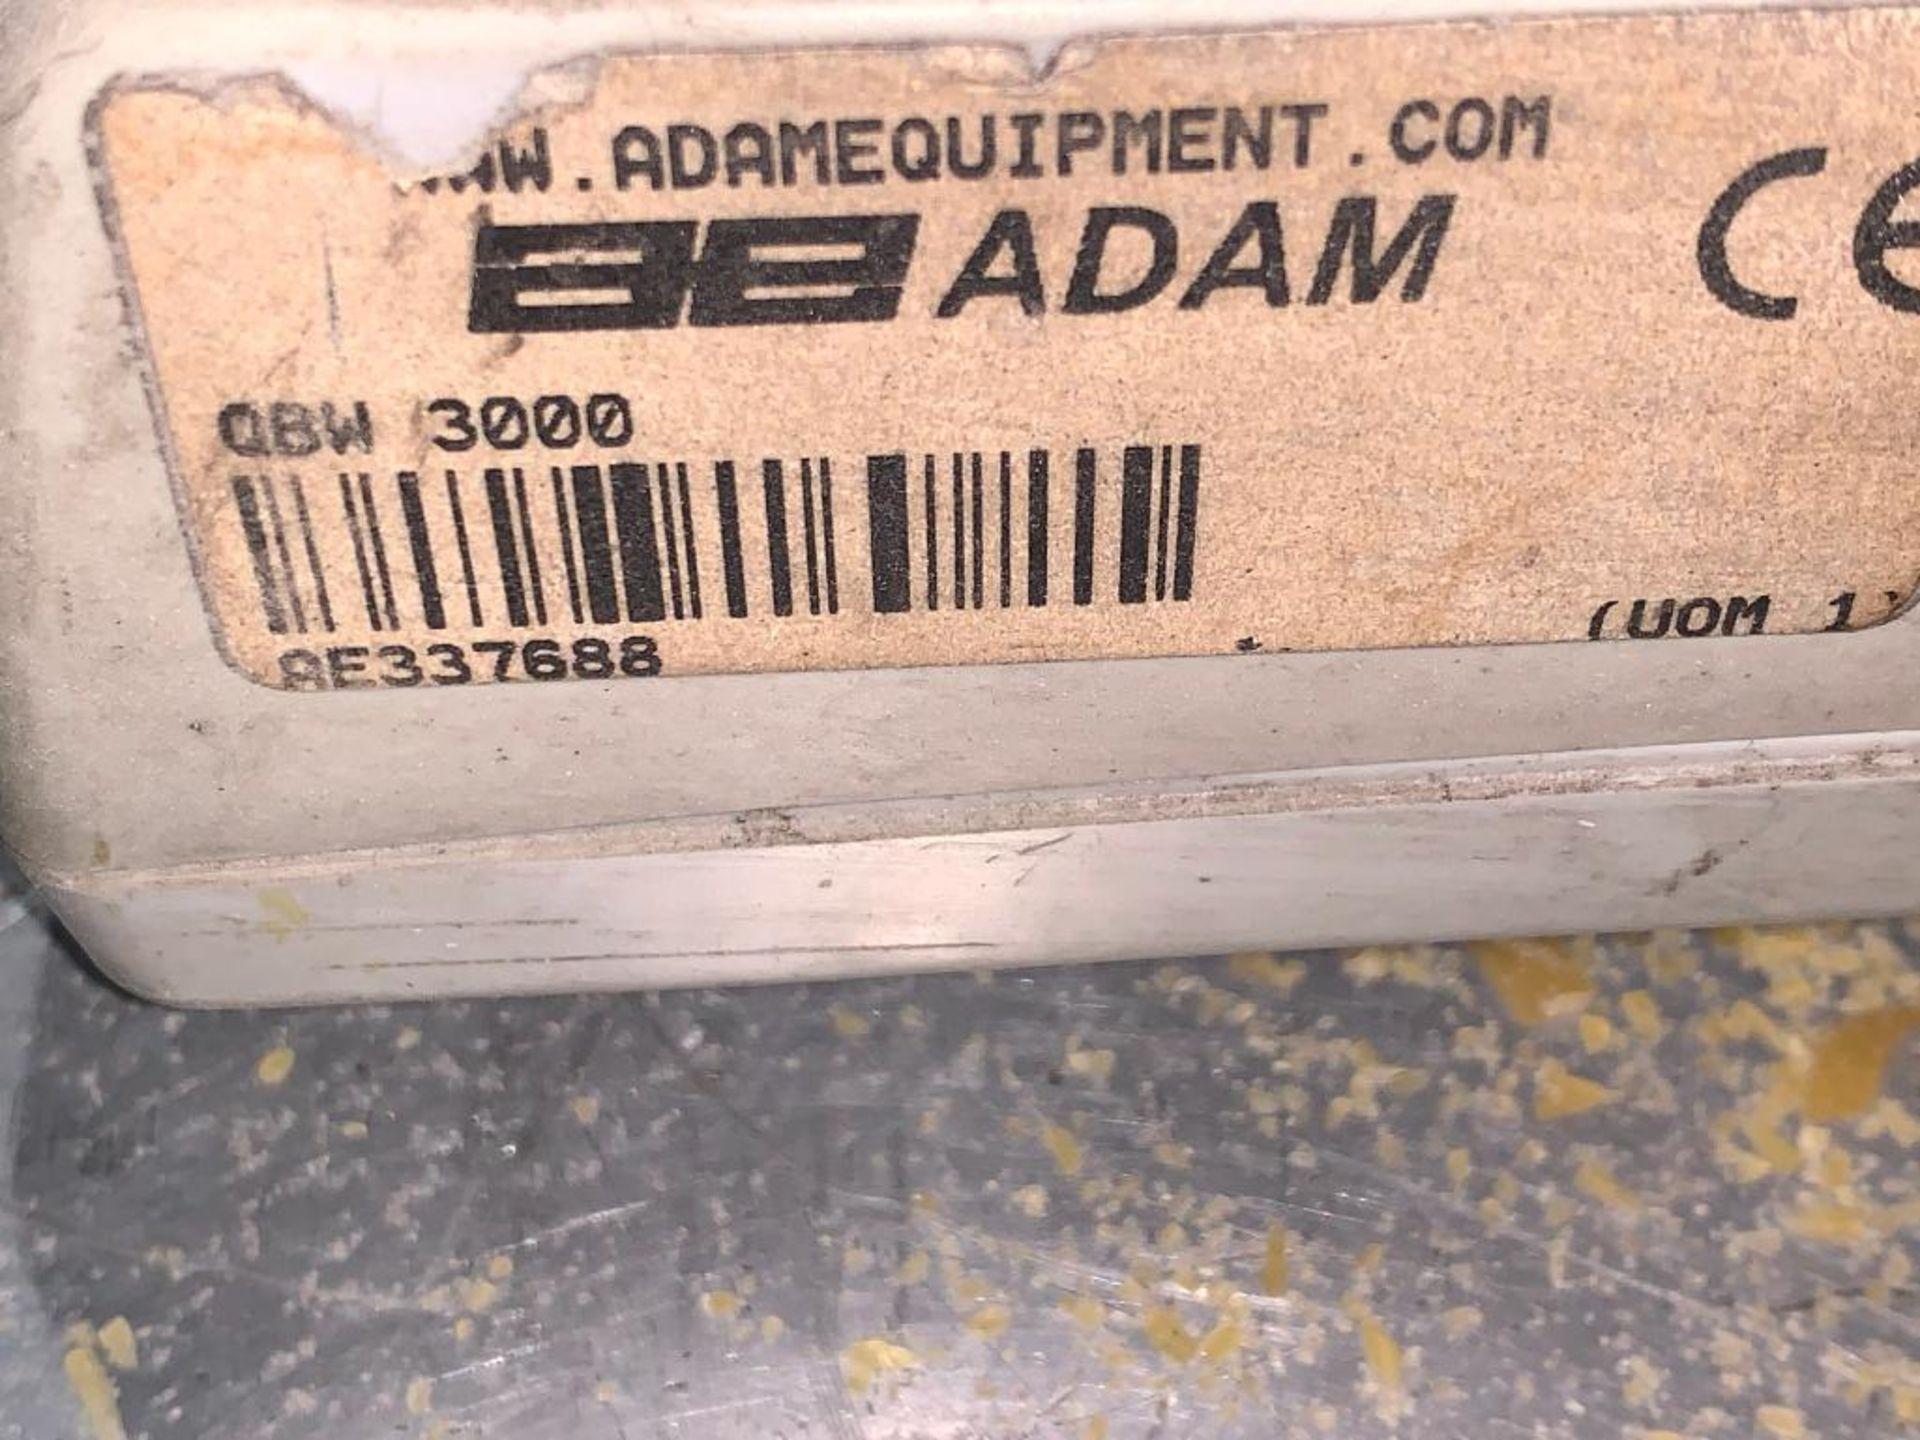 Adam digital scale - Image 3 of 3